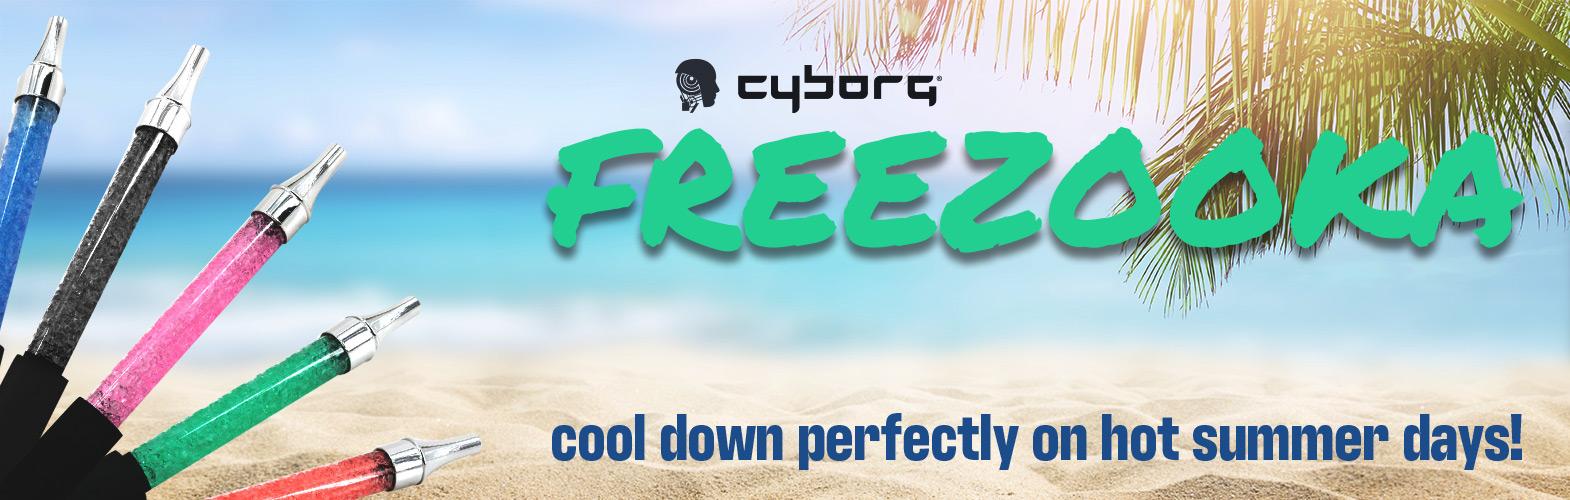 ice mouthpiece cyborg freezooka